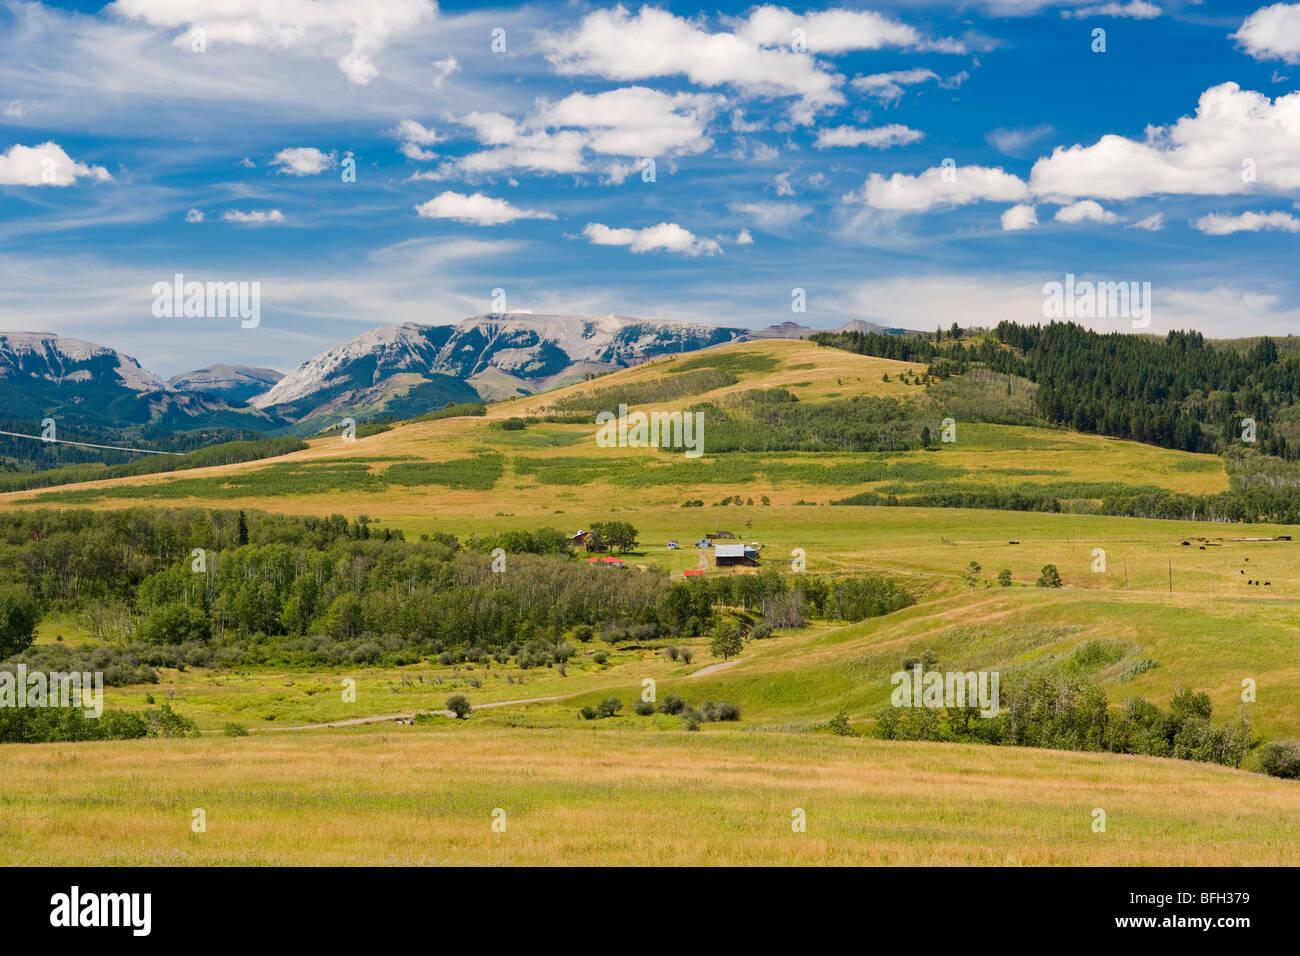 Longview, Crowsnest Highway, Alberta, Canada - Stock Image